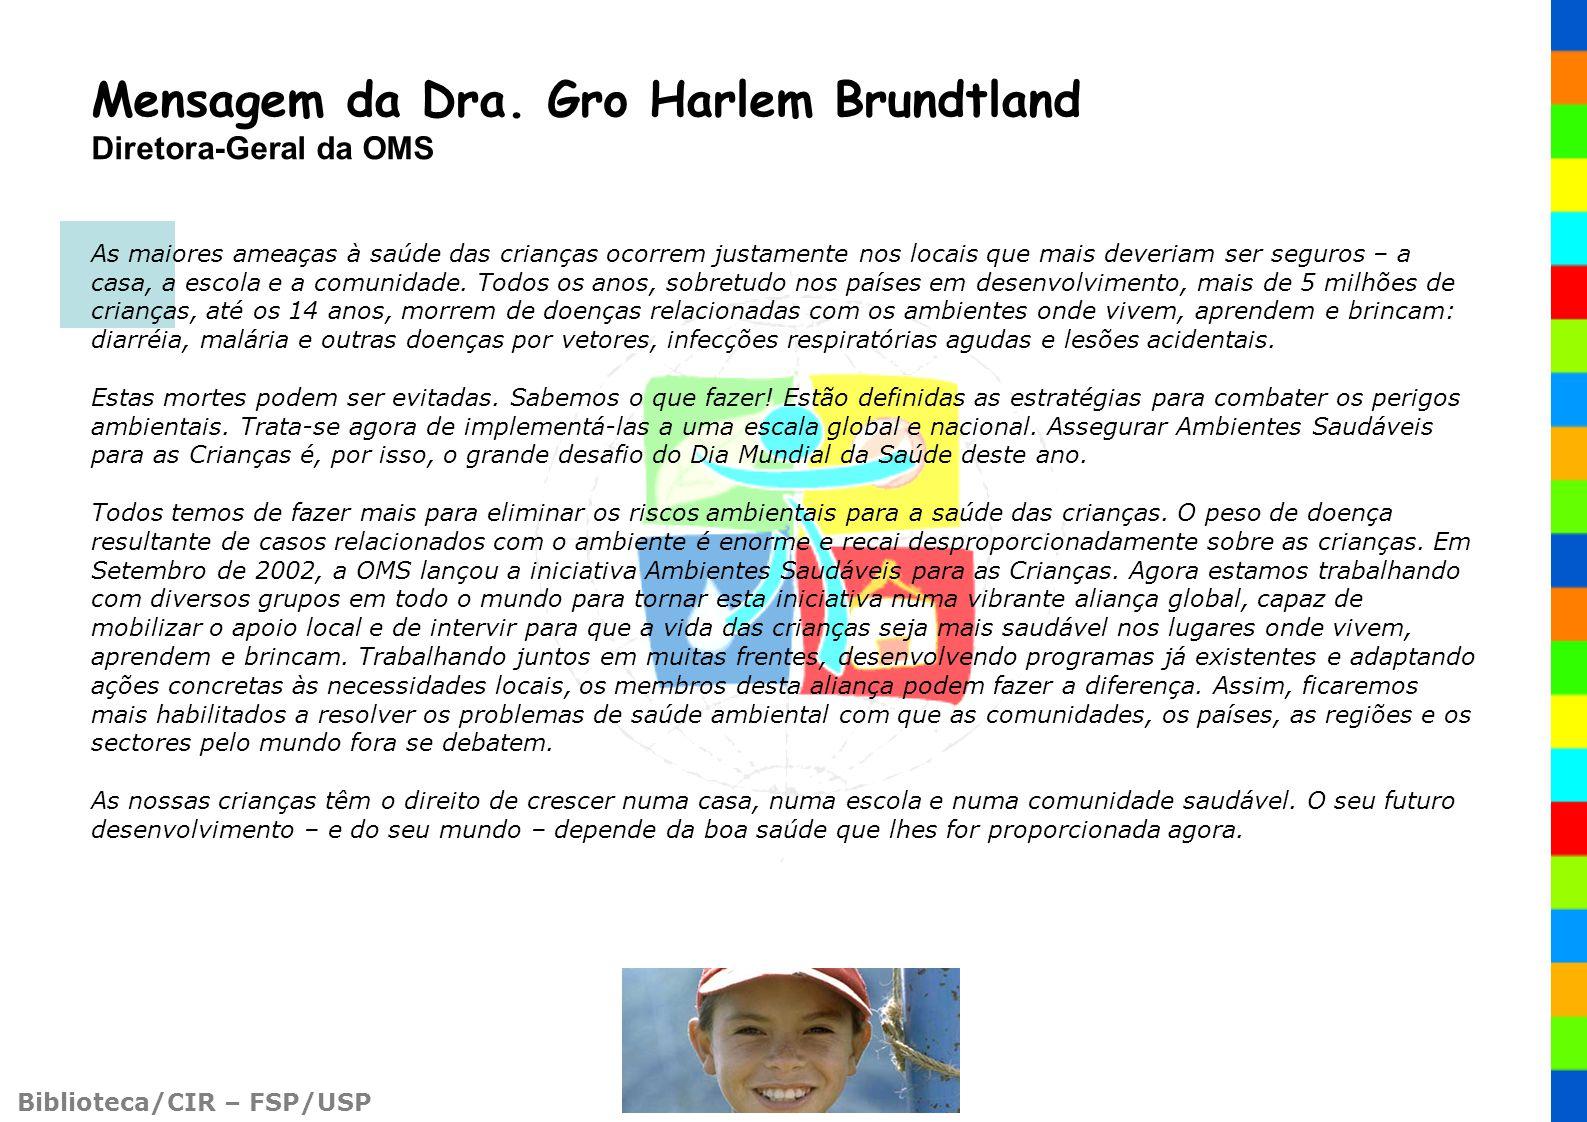 Mensagem da Dra. Gro Harlem Brundtland